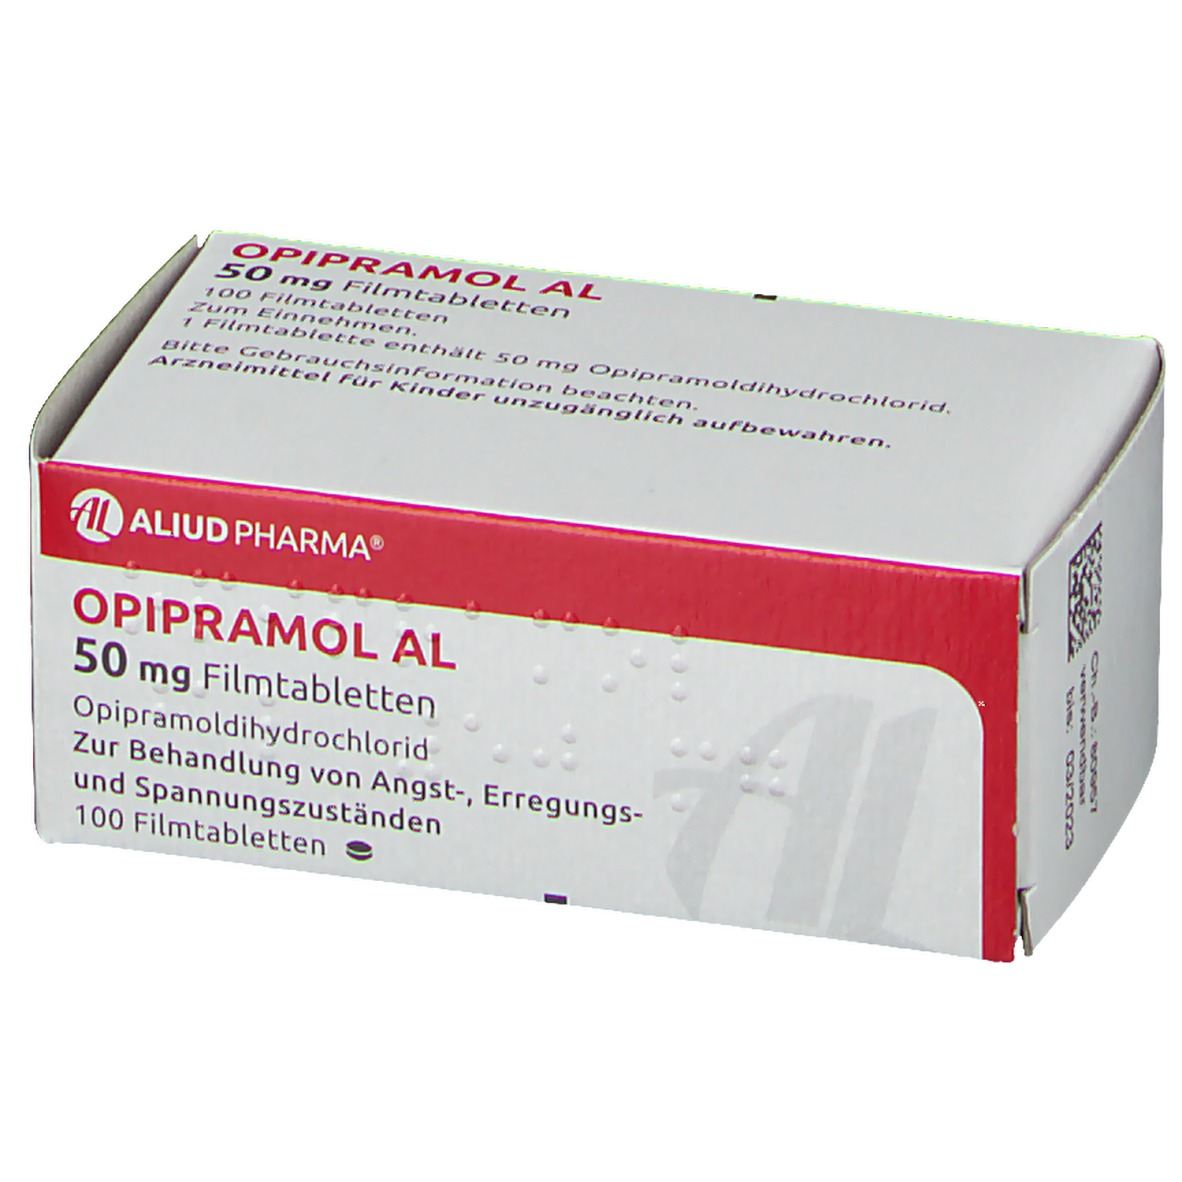 Opipram 50 mg erfahrungen